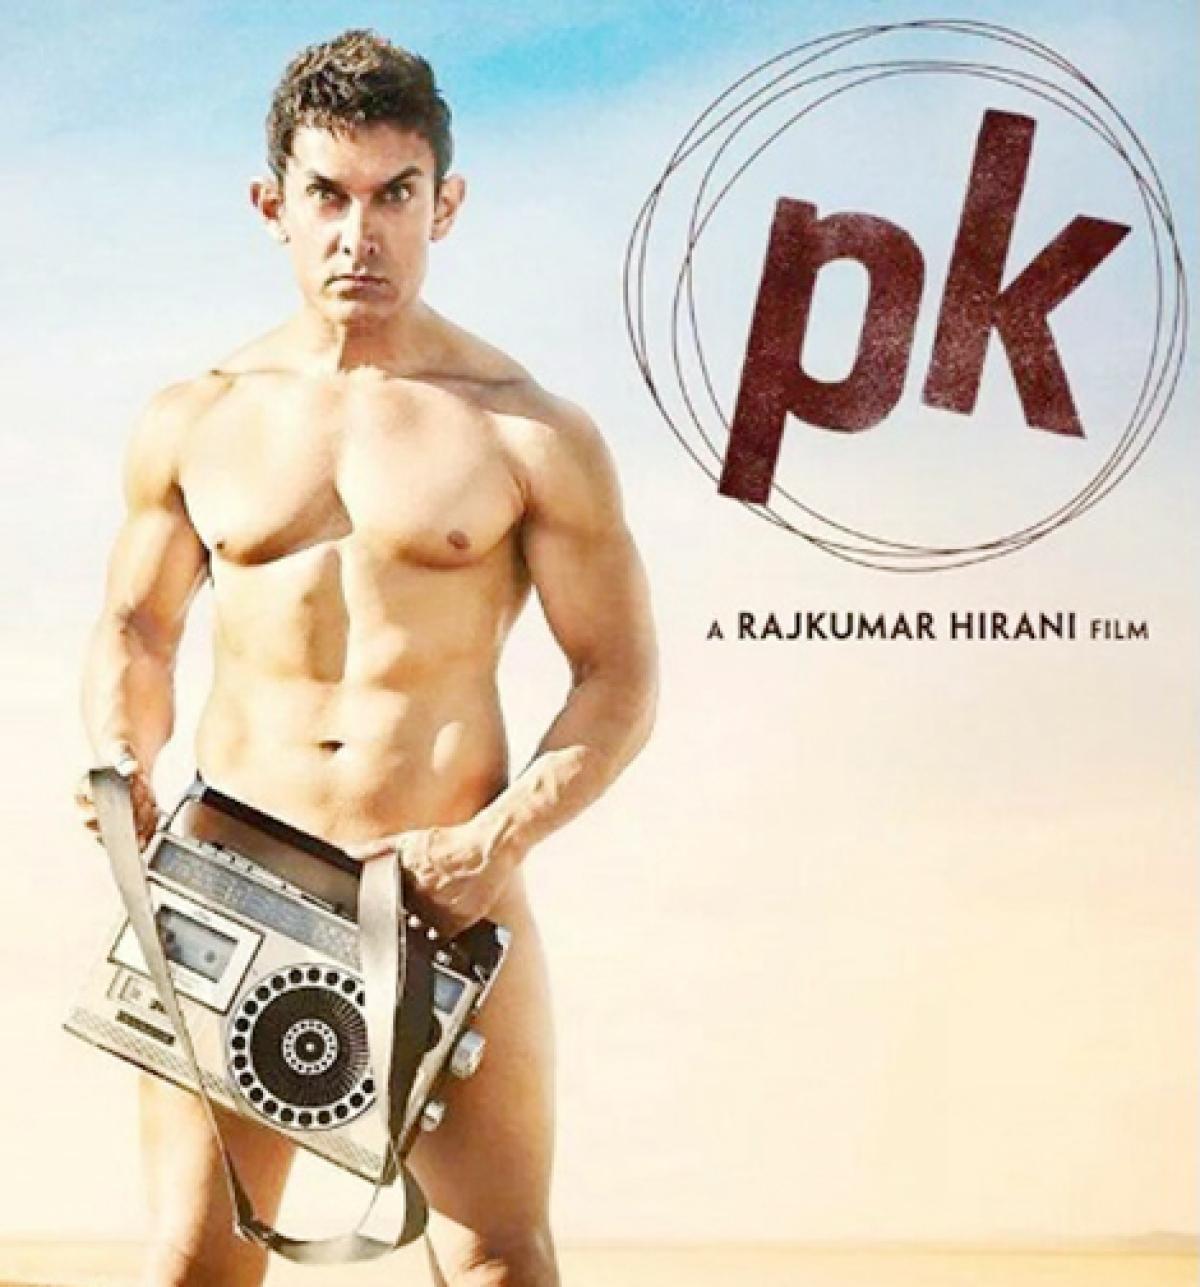 Nude poster 'key art', says Aamir Khan